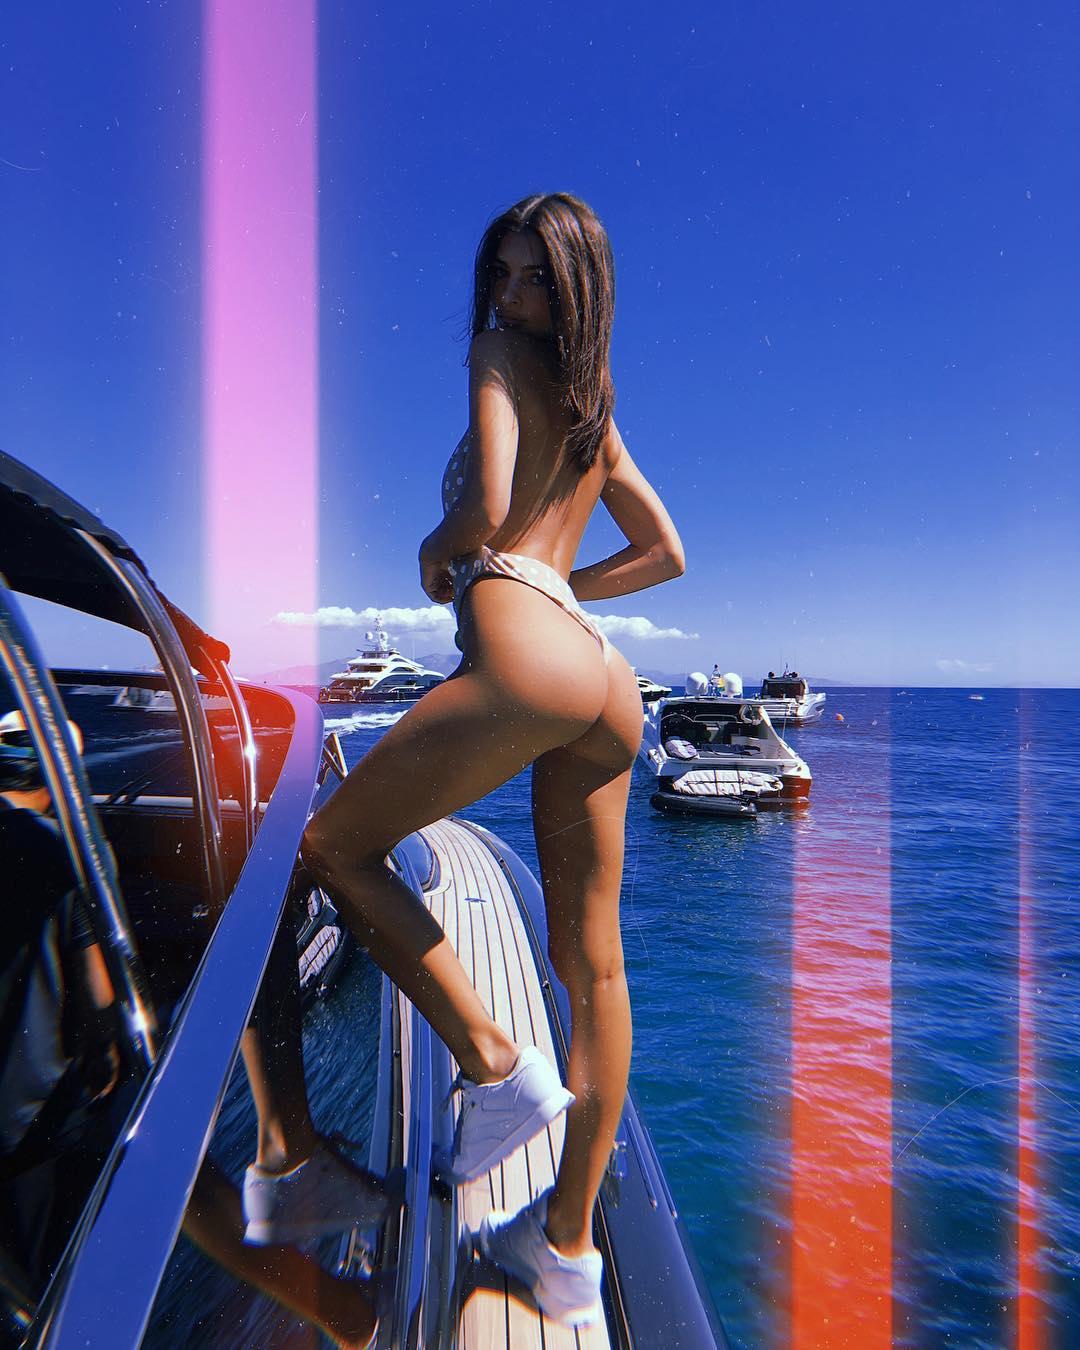 Эмили Ратаковски: Bye Mykonos you were perfect. Swear this is the last photo of me on a boat lol   @gigihadid @nammosmykonos @nammosvillage